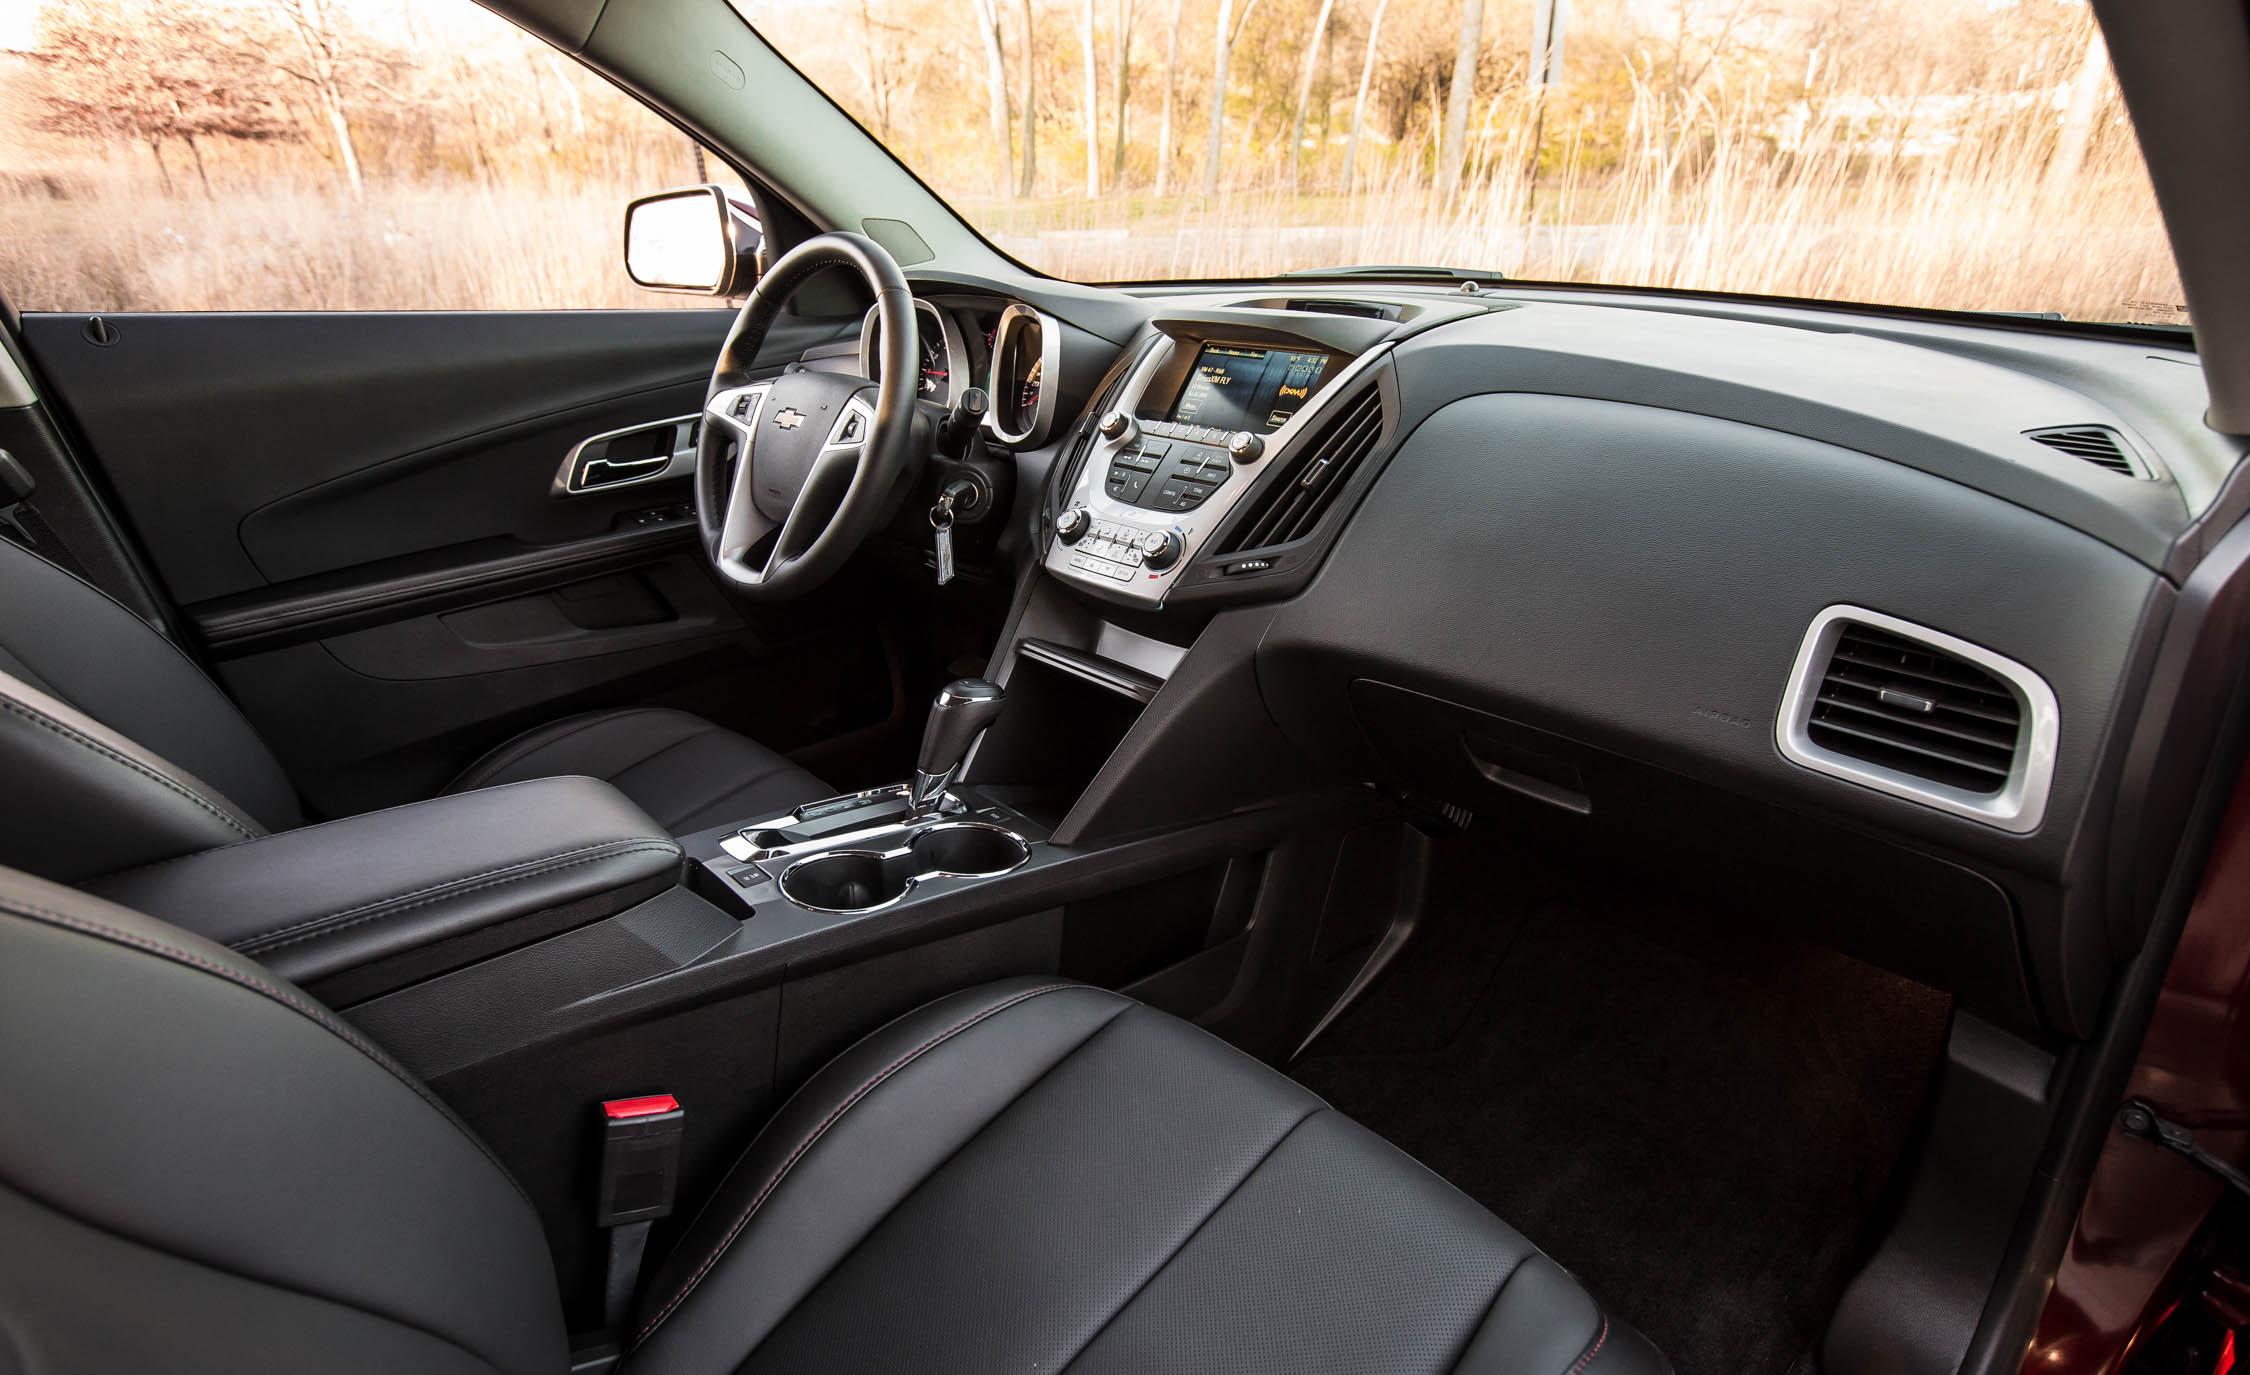 2016 Chevrolet Equinox LTZ (Photo 4 of 25)